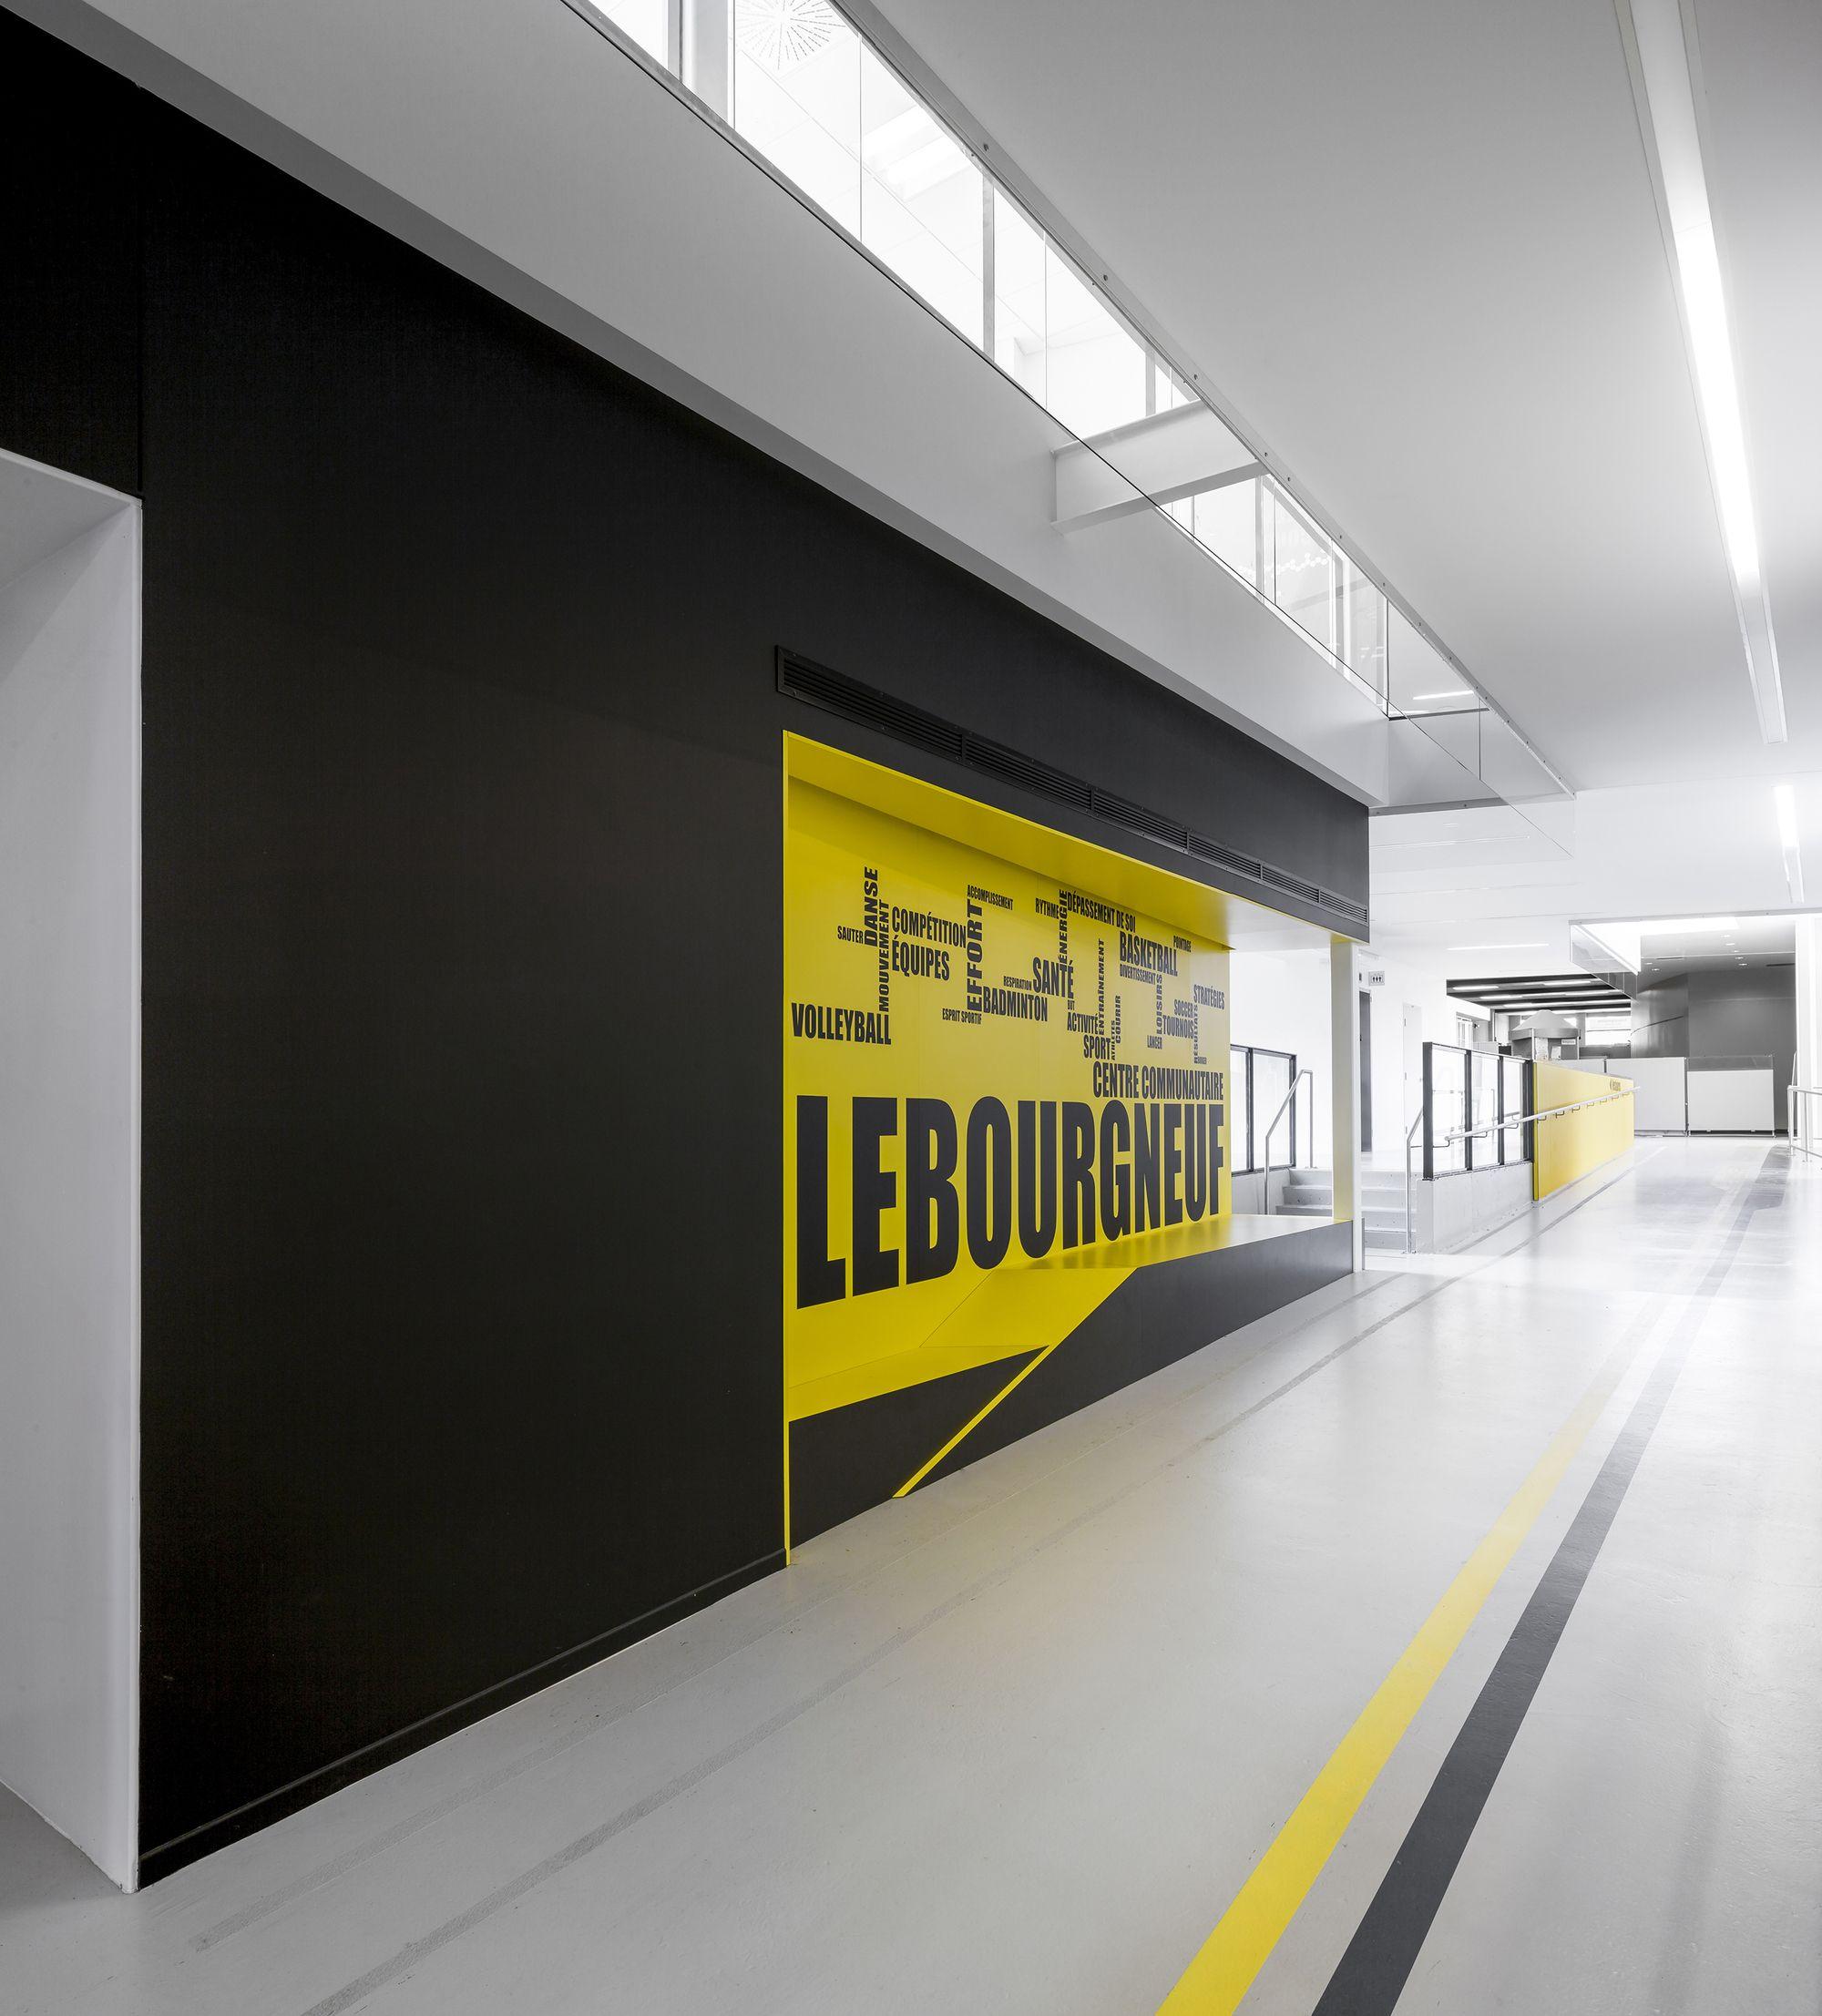 Centro comunitario Lebourgneuf / CCM2 architectes